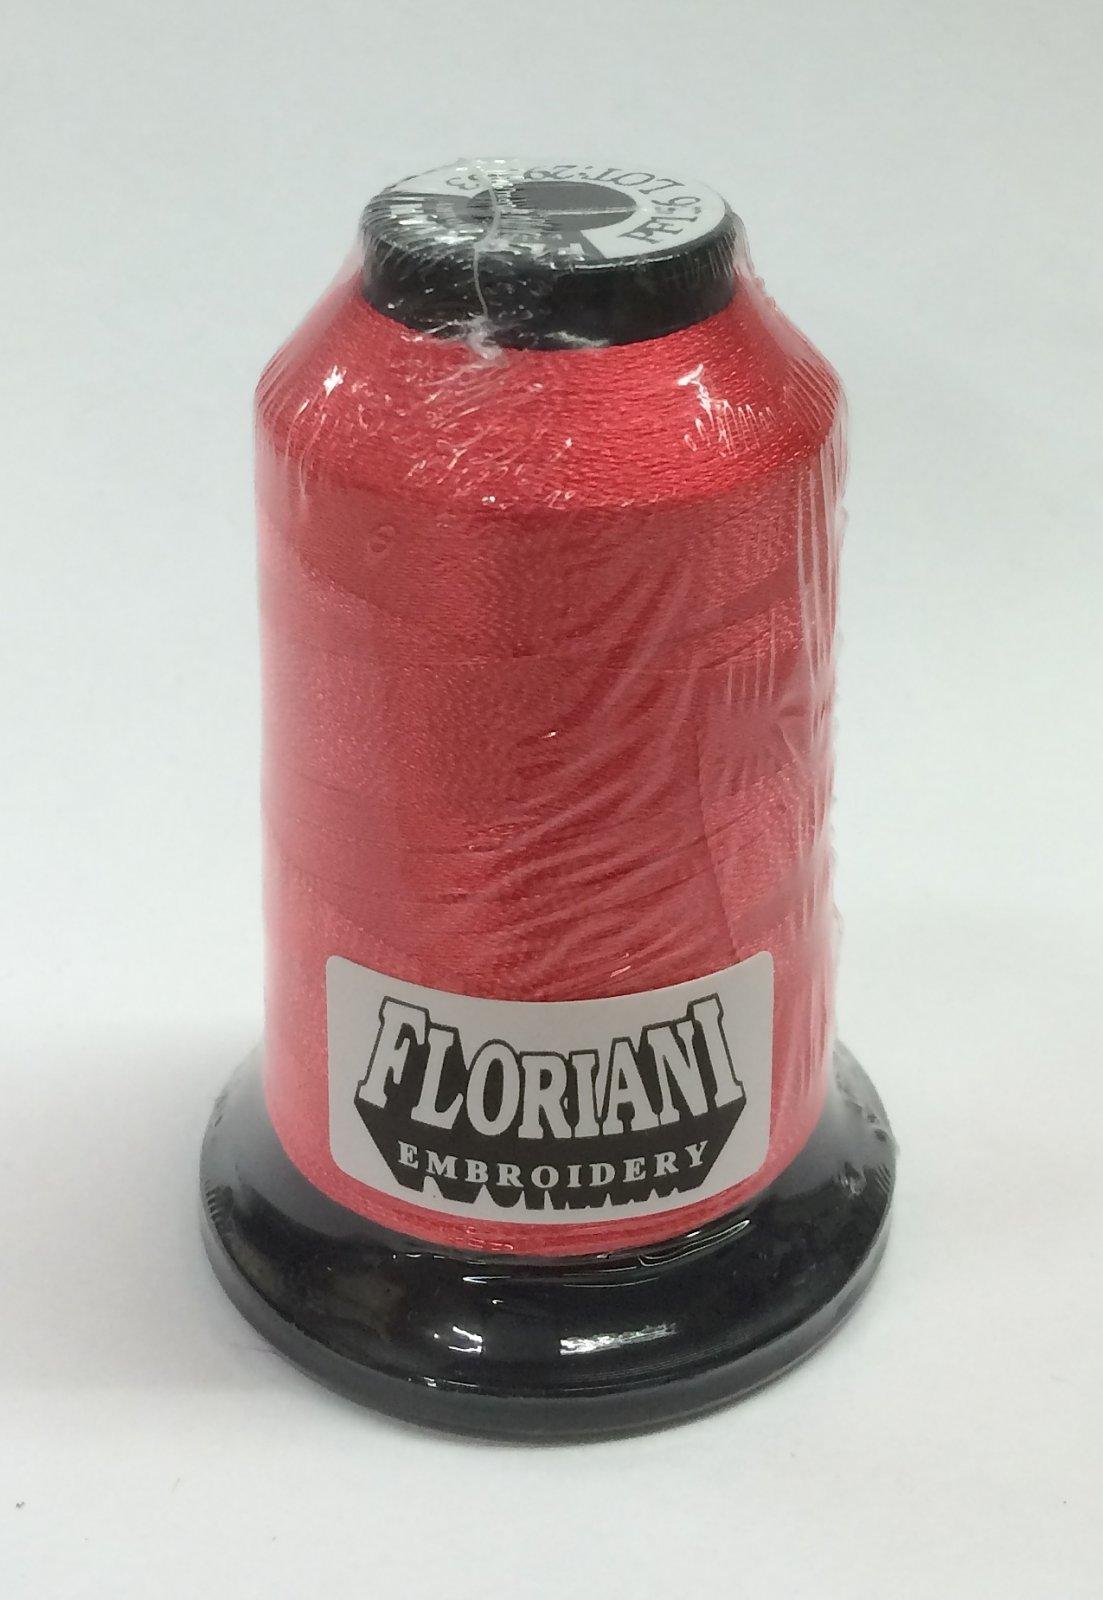 Floriani Embroidery Thread Color #0156